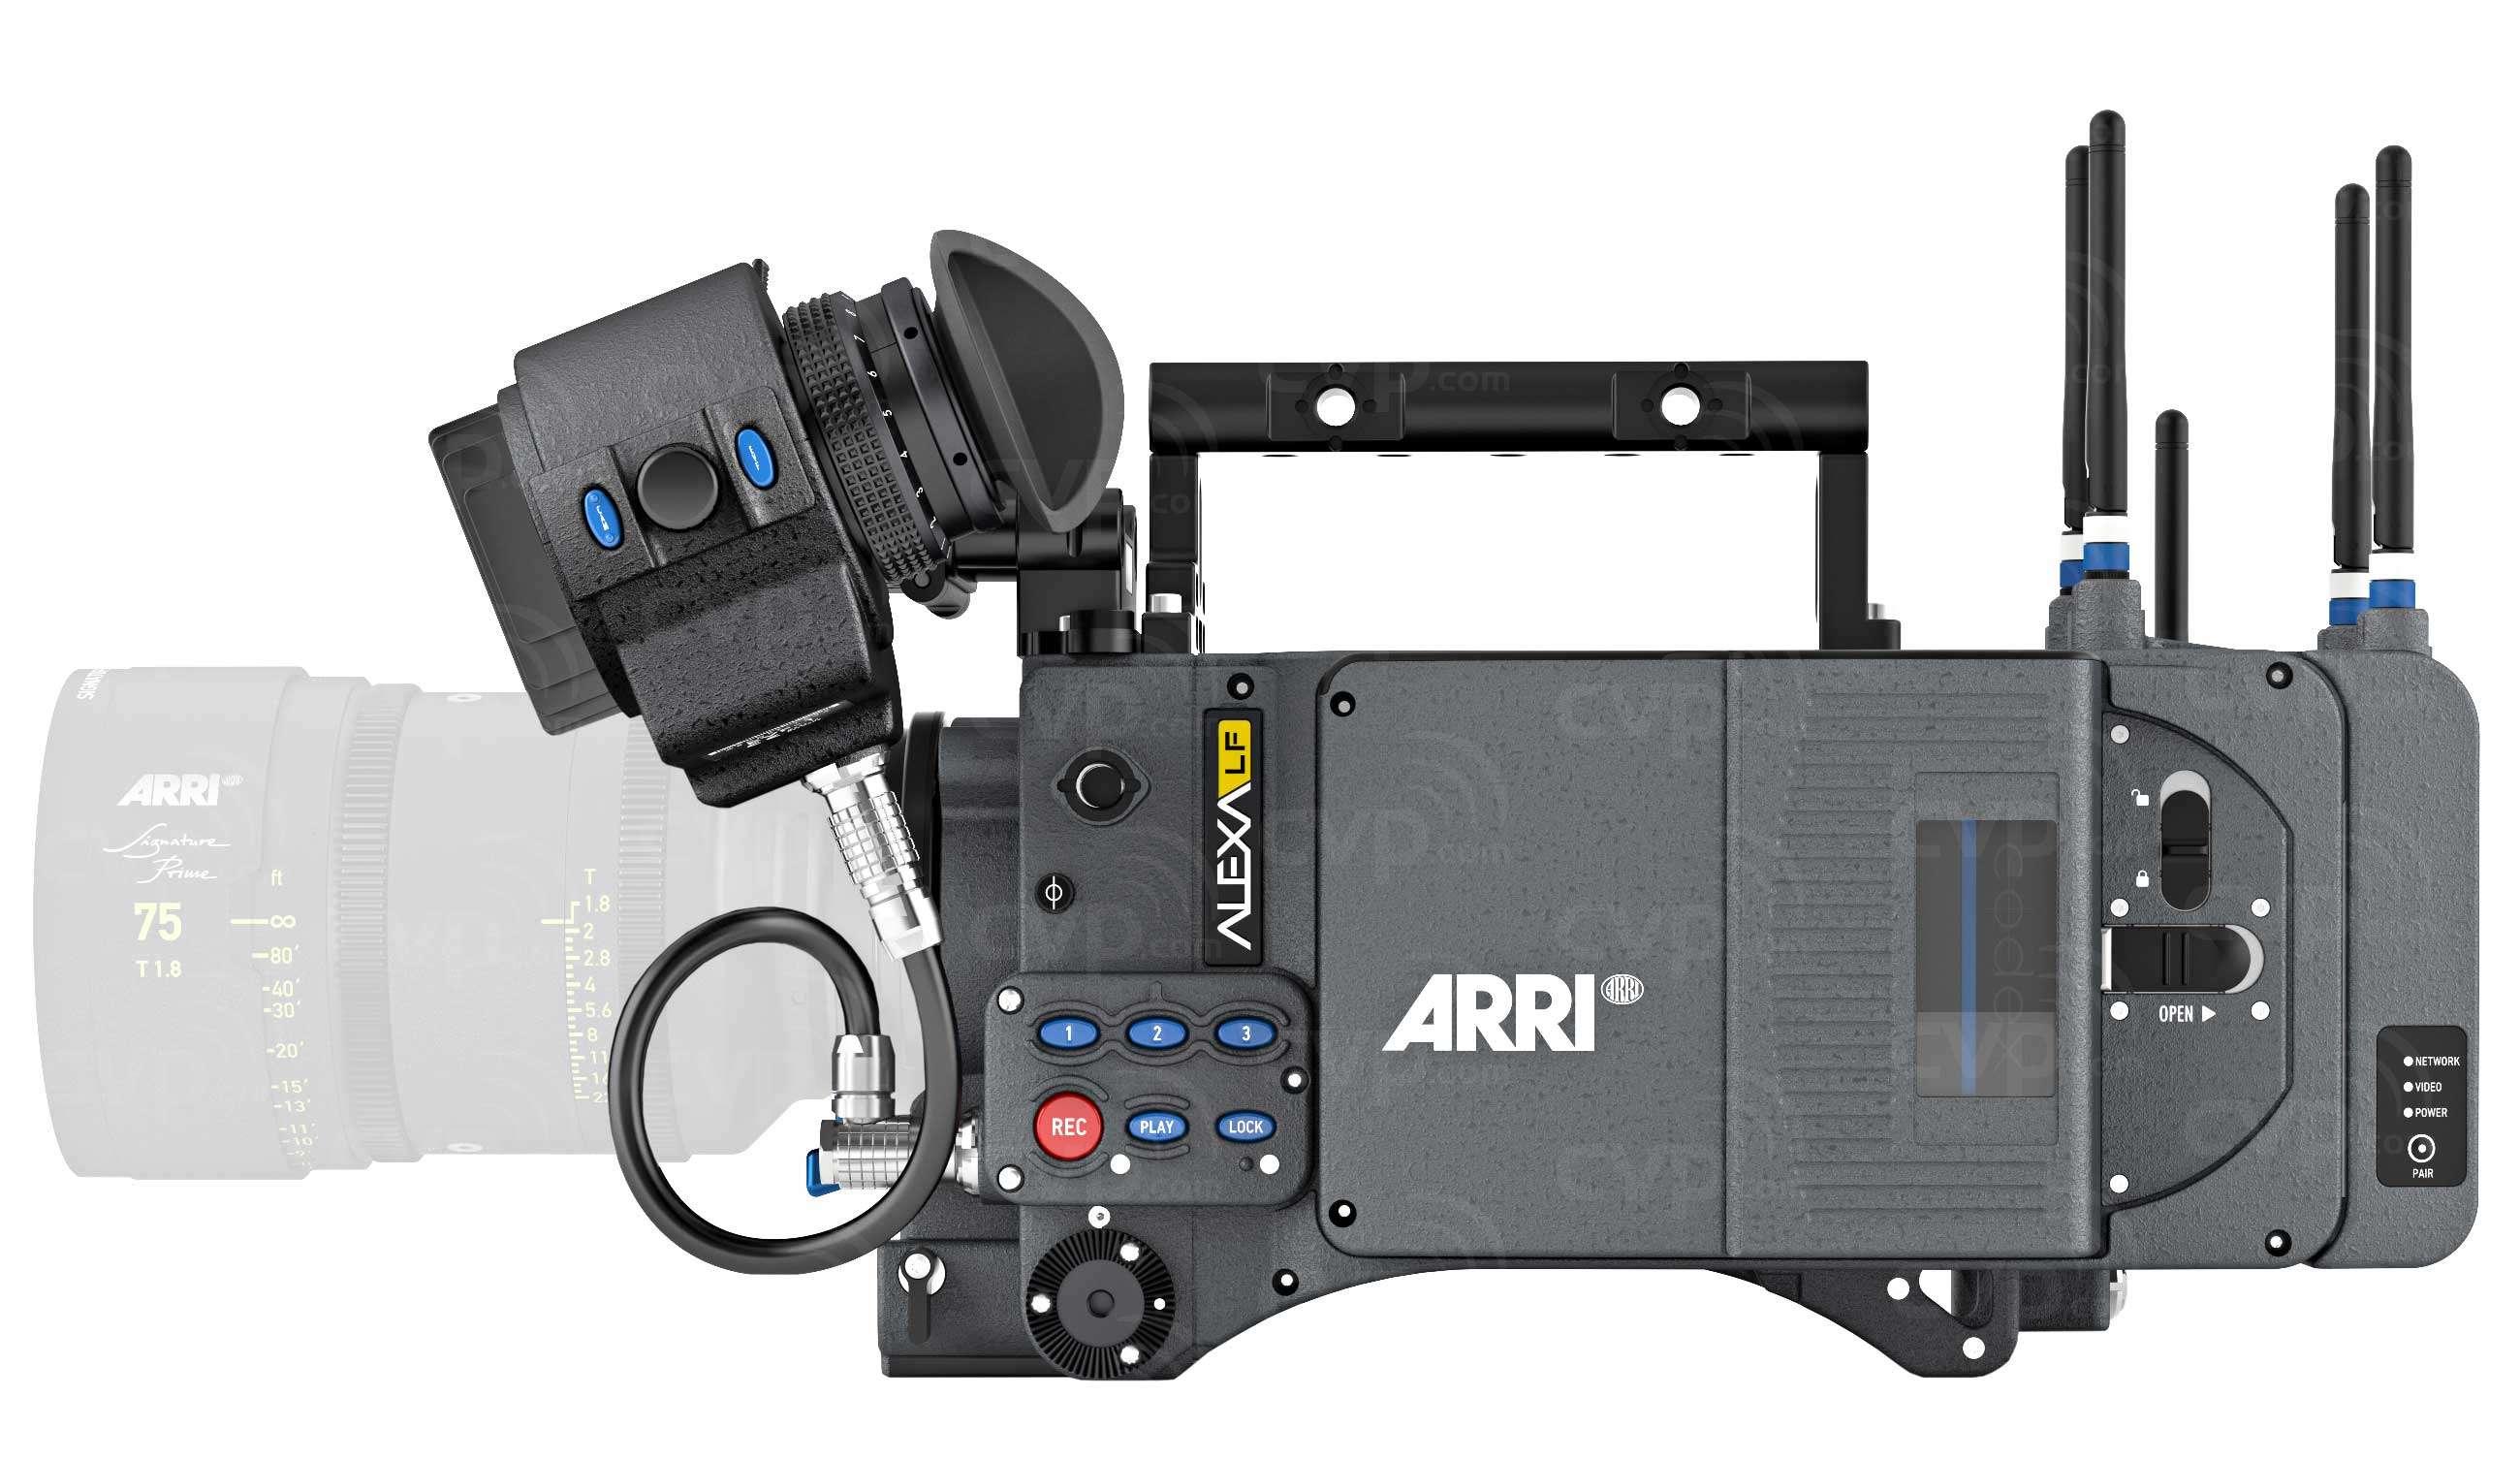 Buy Arri Alexa Lf Large Format Digital Camera Basic